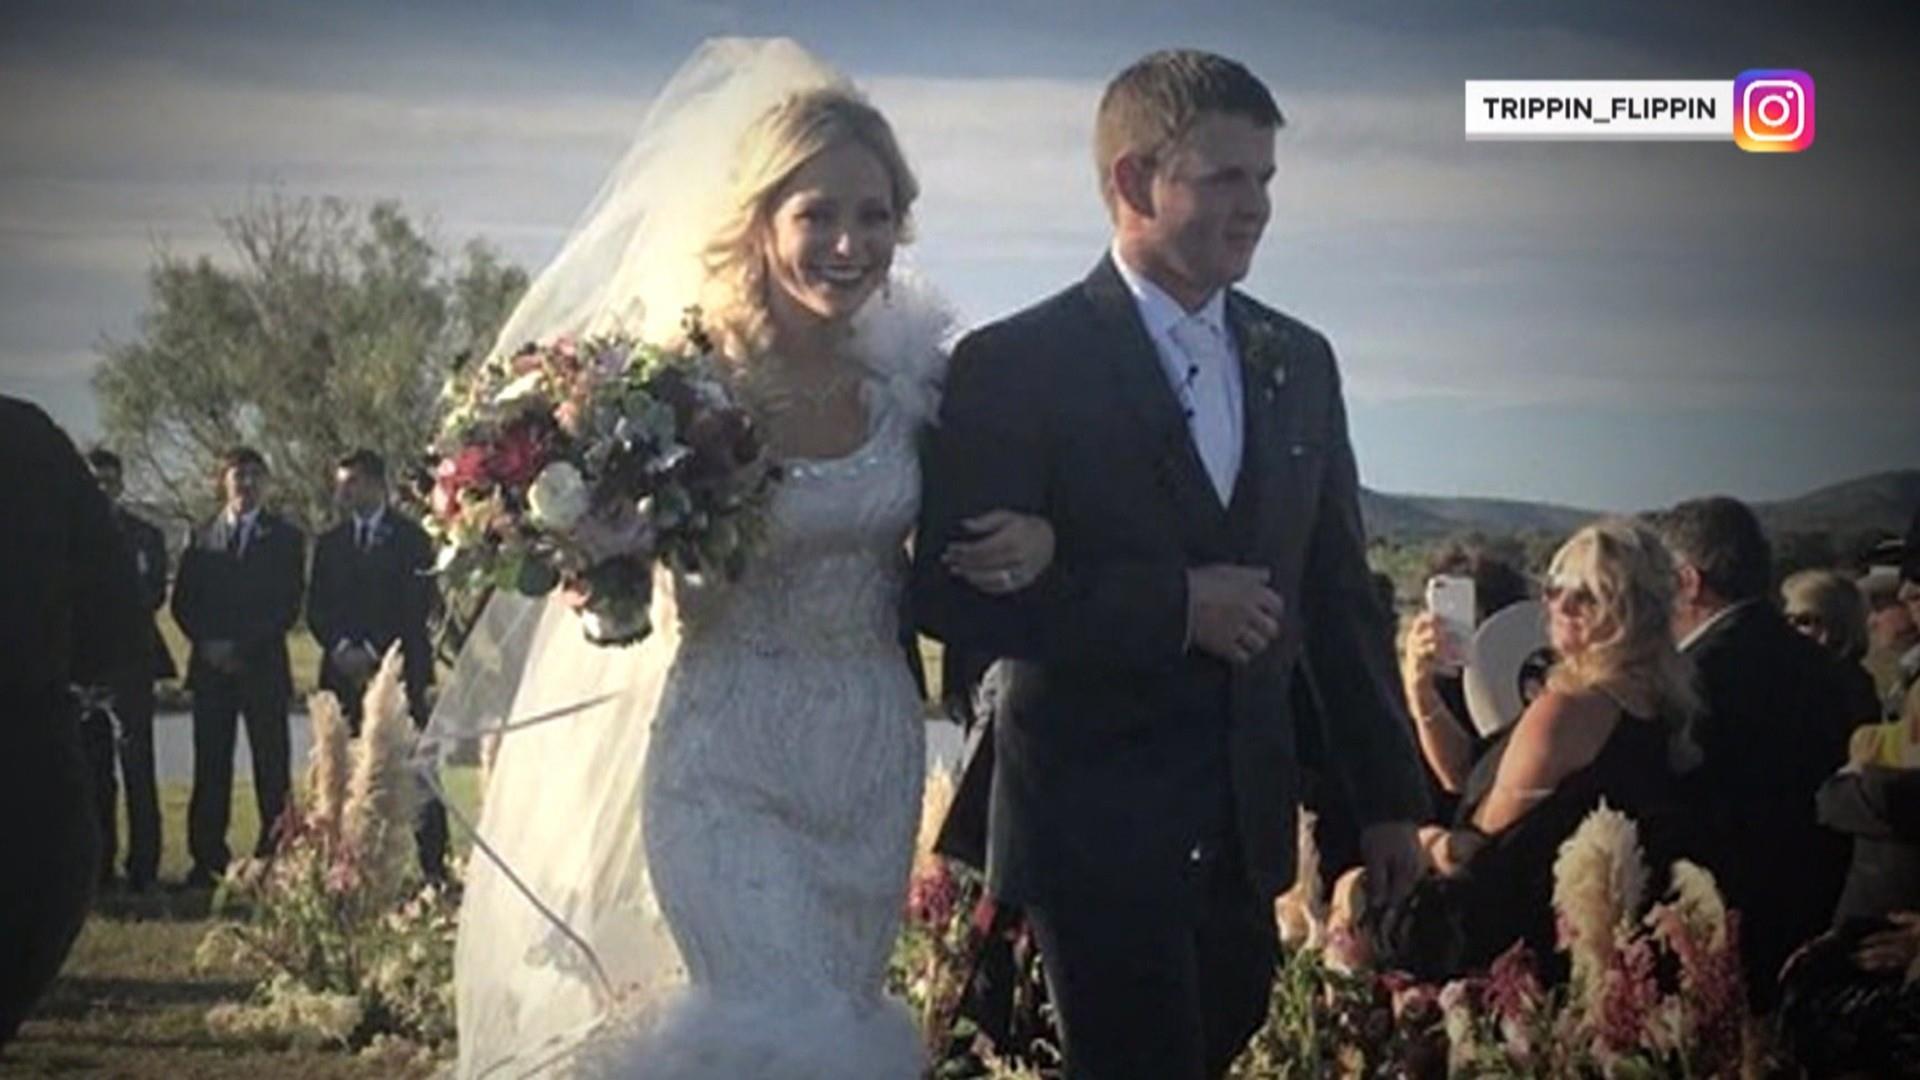 Wedding Helicopter Crash.Newlyweds Killed In Helicopter Crash Leaving Wedding Ceremony